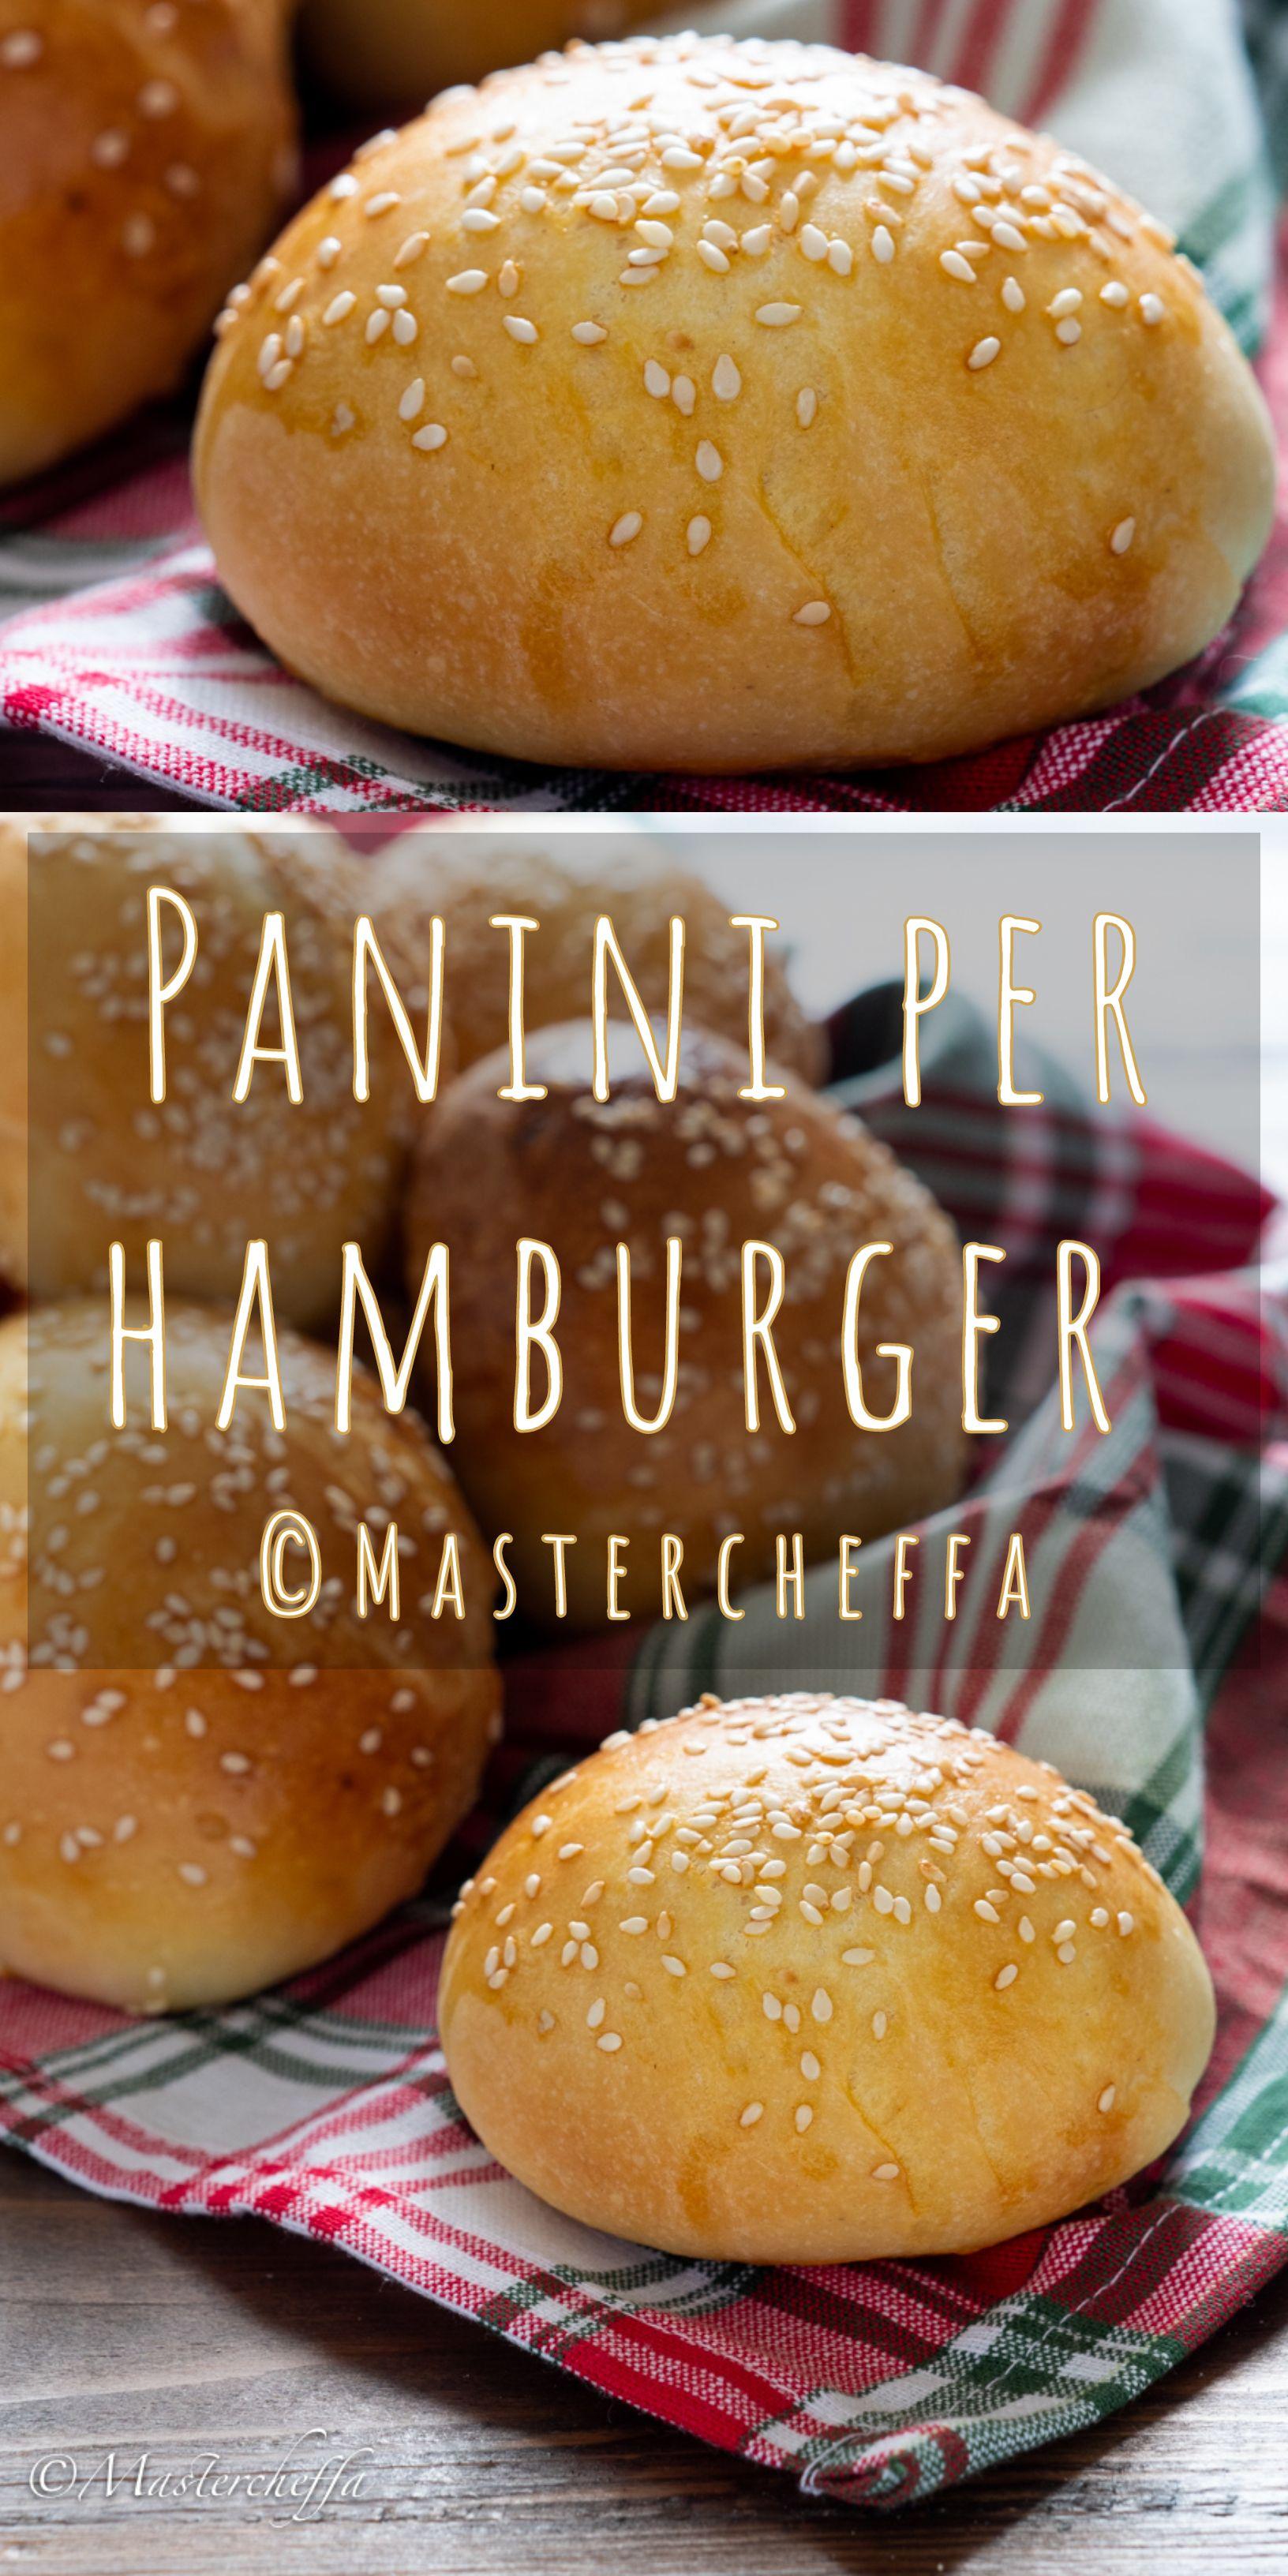 0654e964f72531089bb8c6a1f40e5f6c - Panini Hamburger Ricette